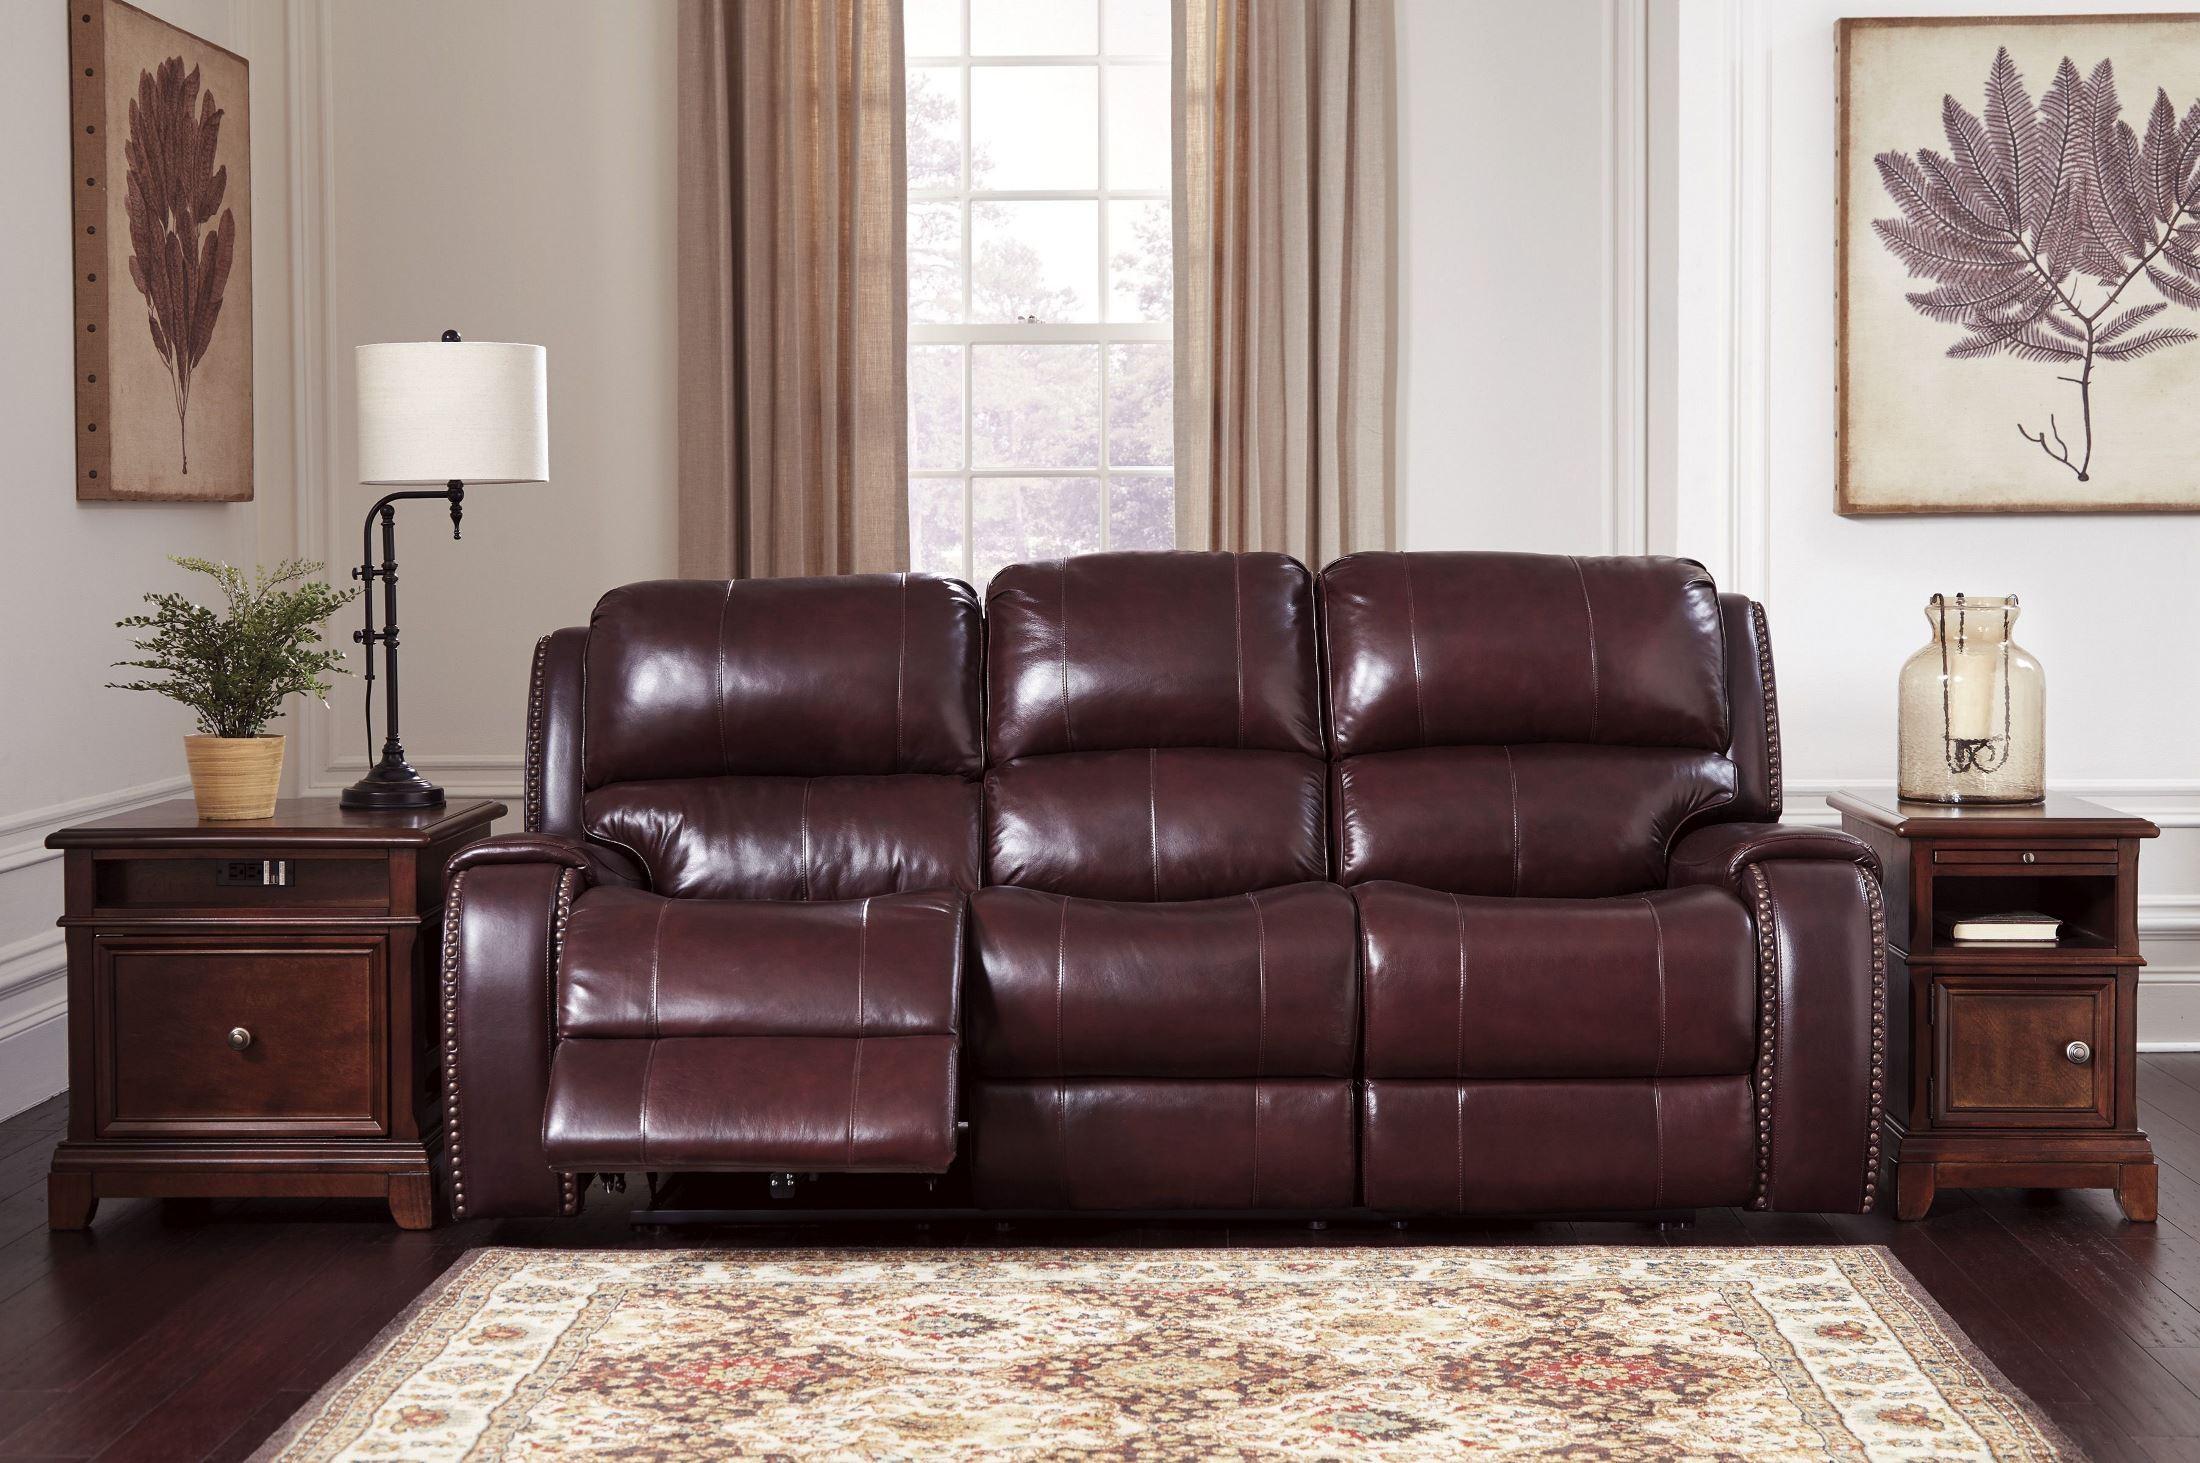 Bon Gilmanton Burgundy Power Reclining Sofa With Adjustable Headrest From  Ashley | Coleman Furniture